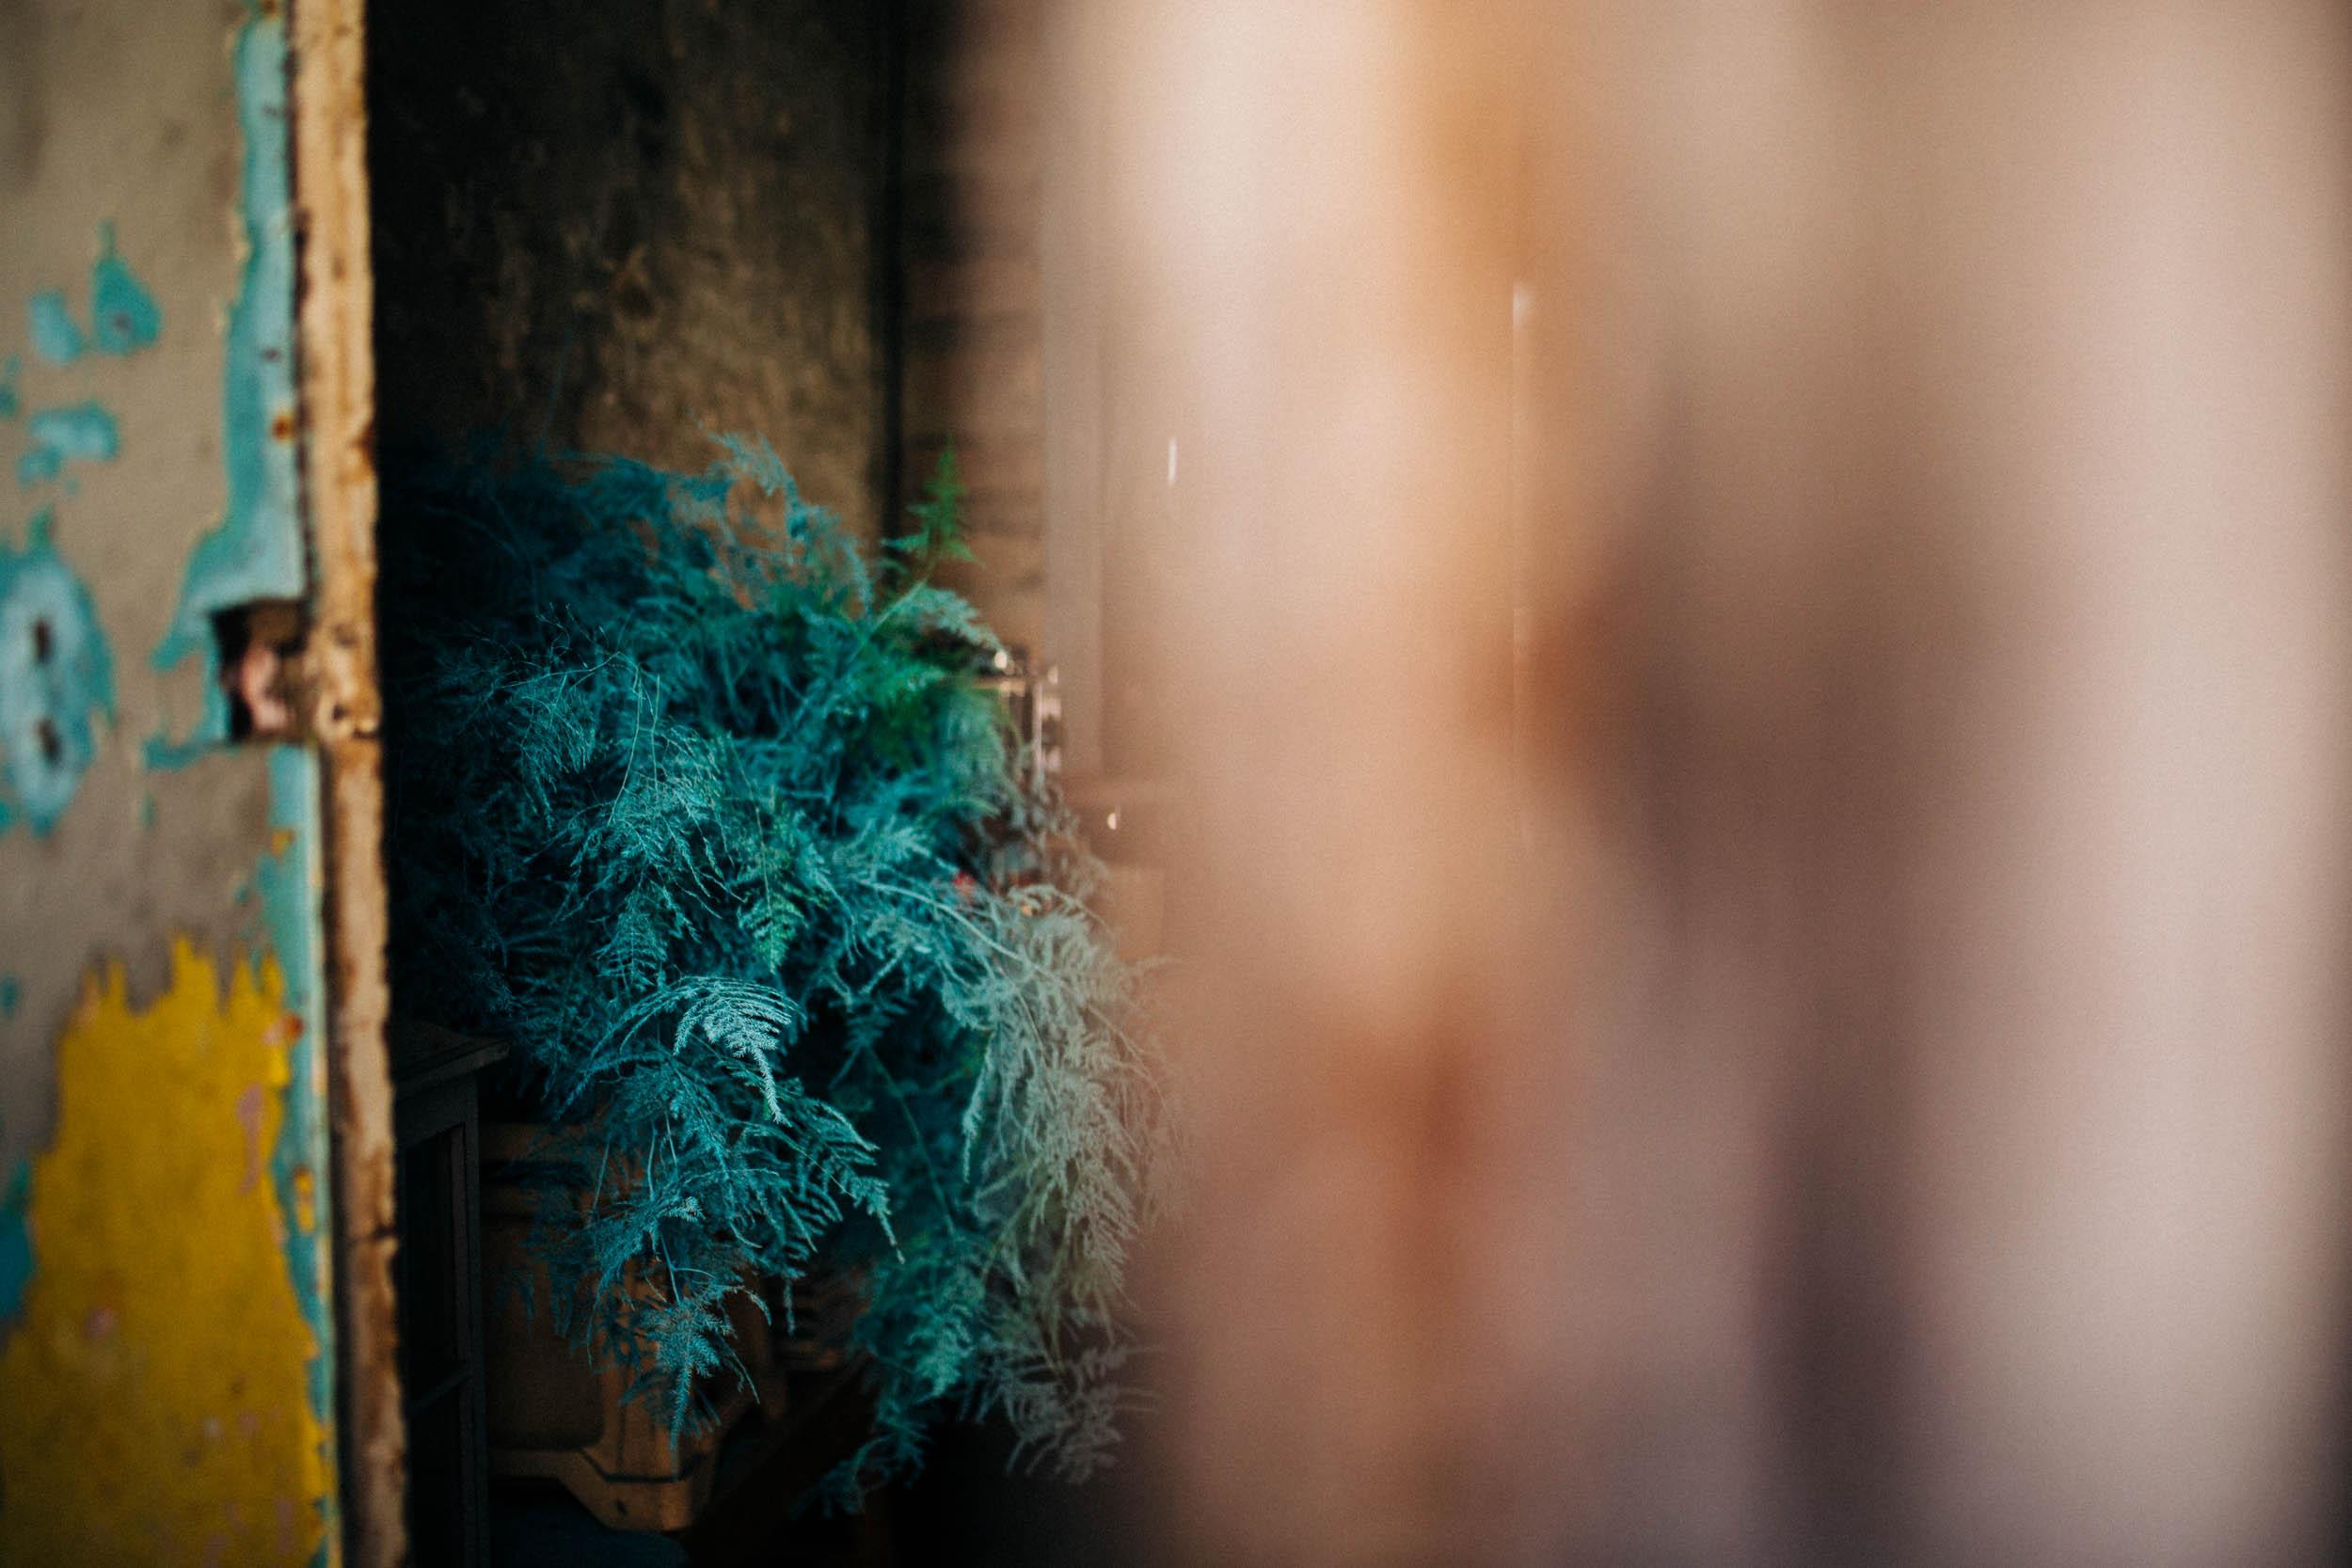 Alex_Sedgmond_Photography-Forbesfield-Cardiff_SouthWales-21.jpg